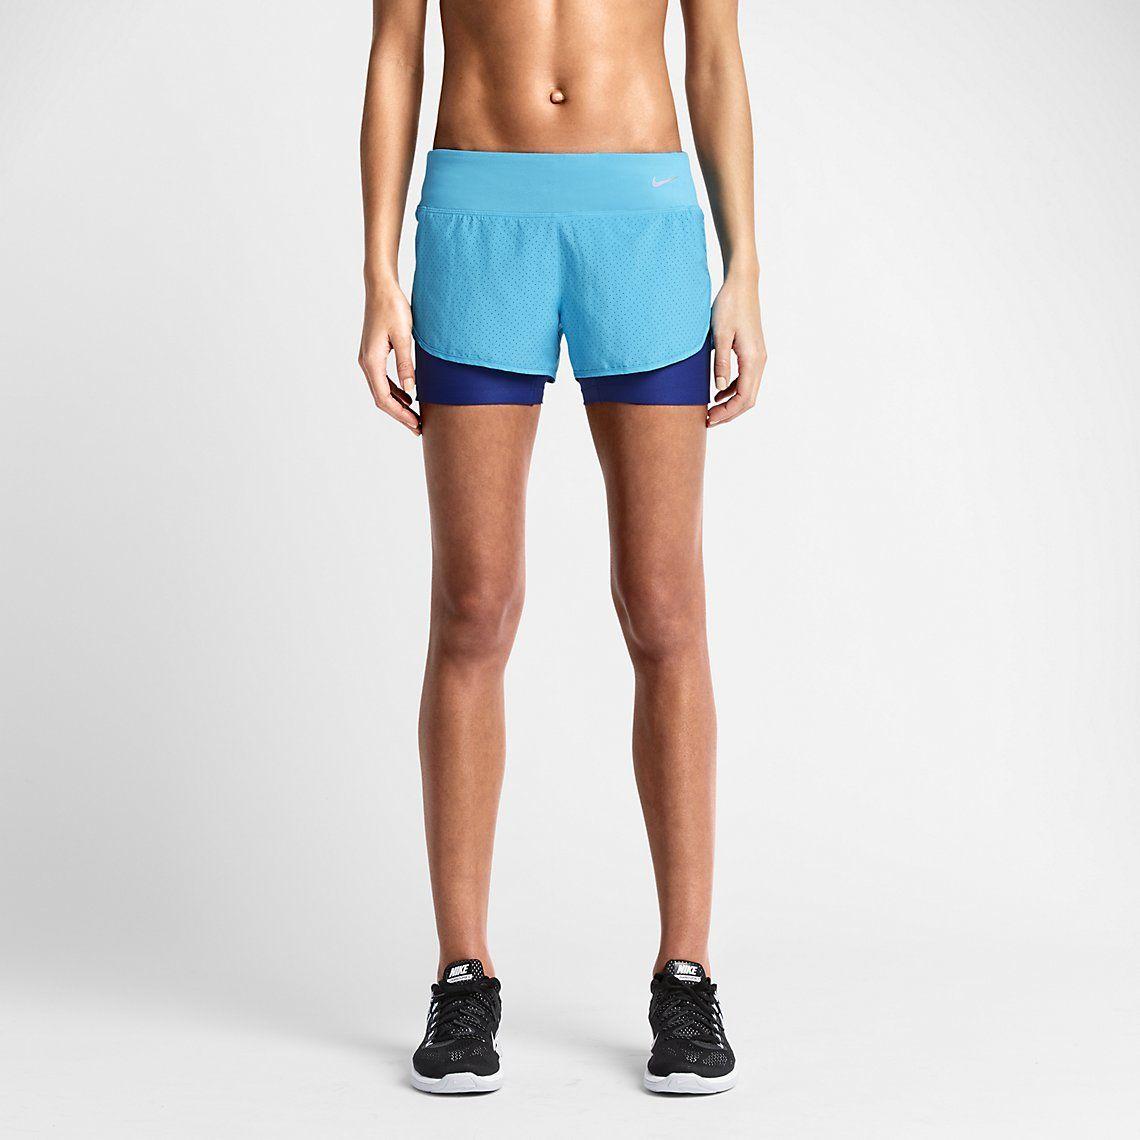 Nike Epic Run Lux Tights Sportswear for Women Shop Womens Sportswear COLOUR-royal